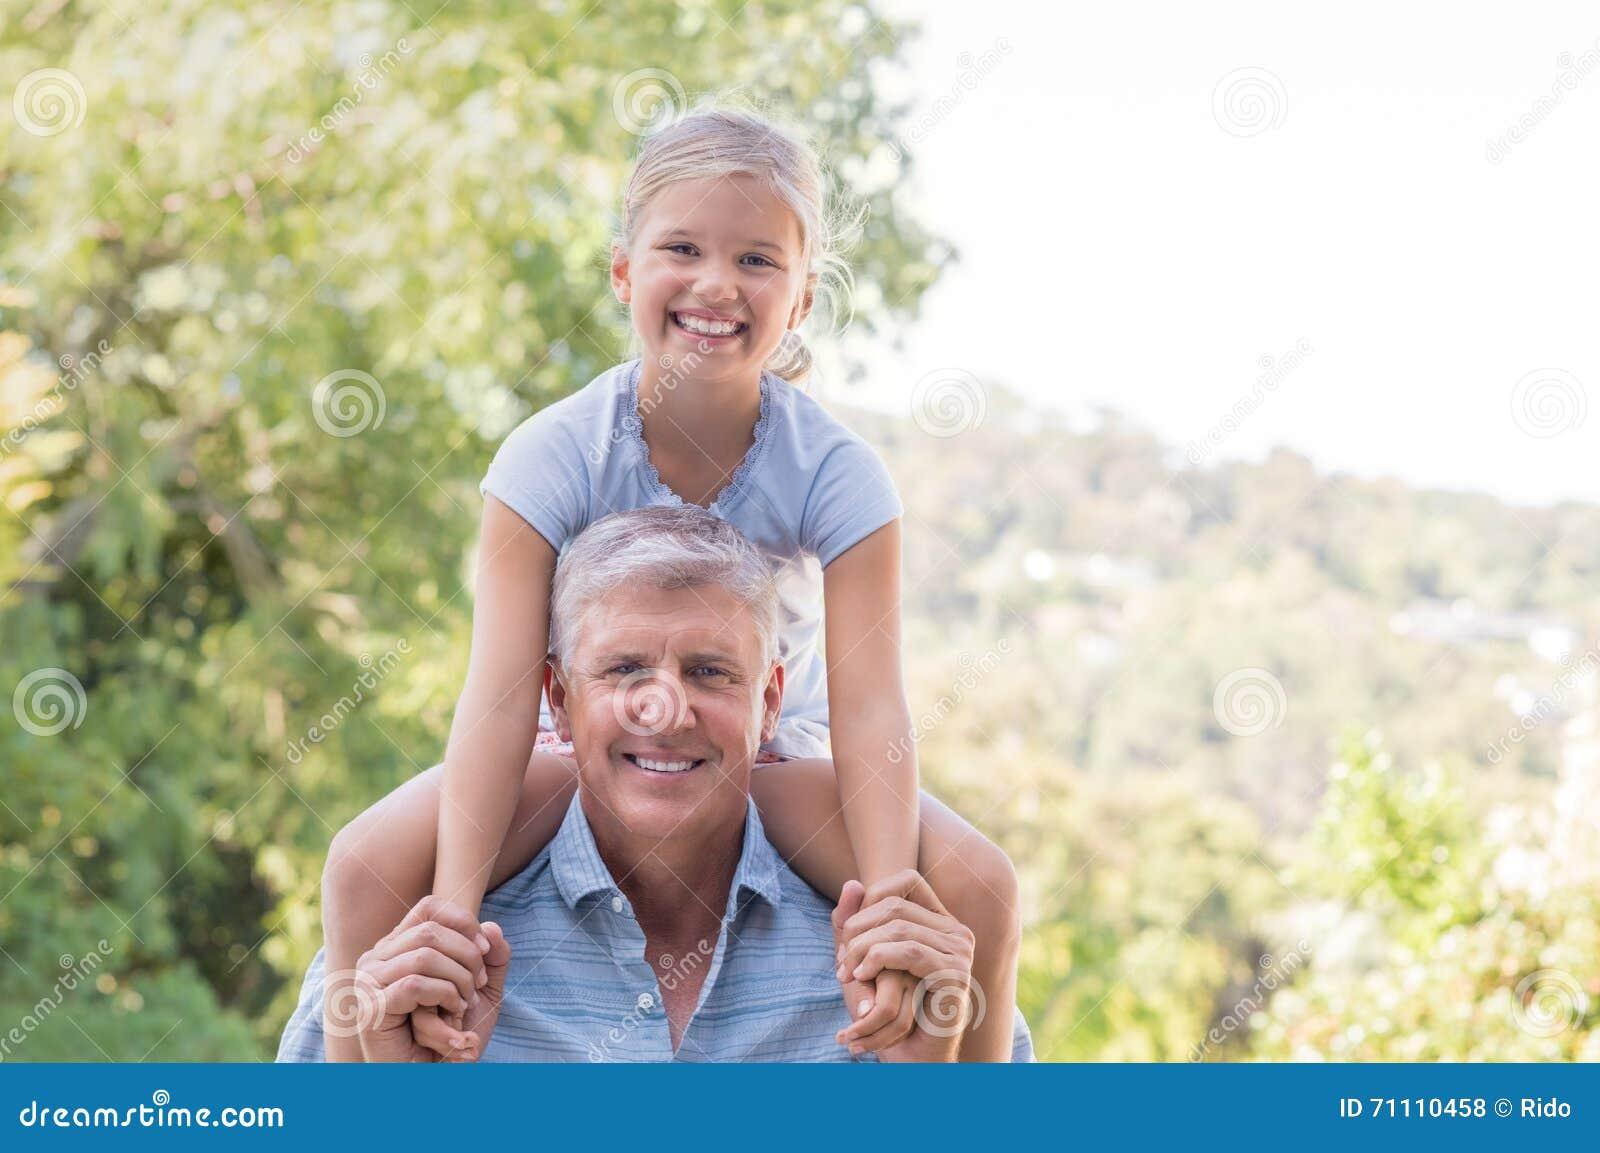 Beauty and senior grandpa on granddaughter